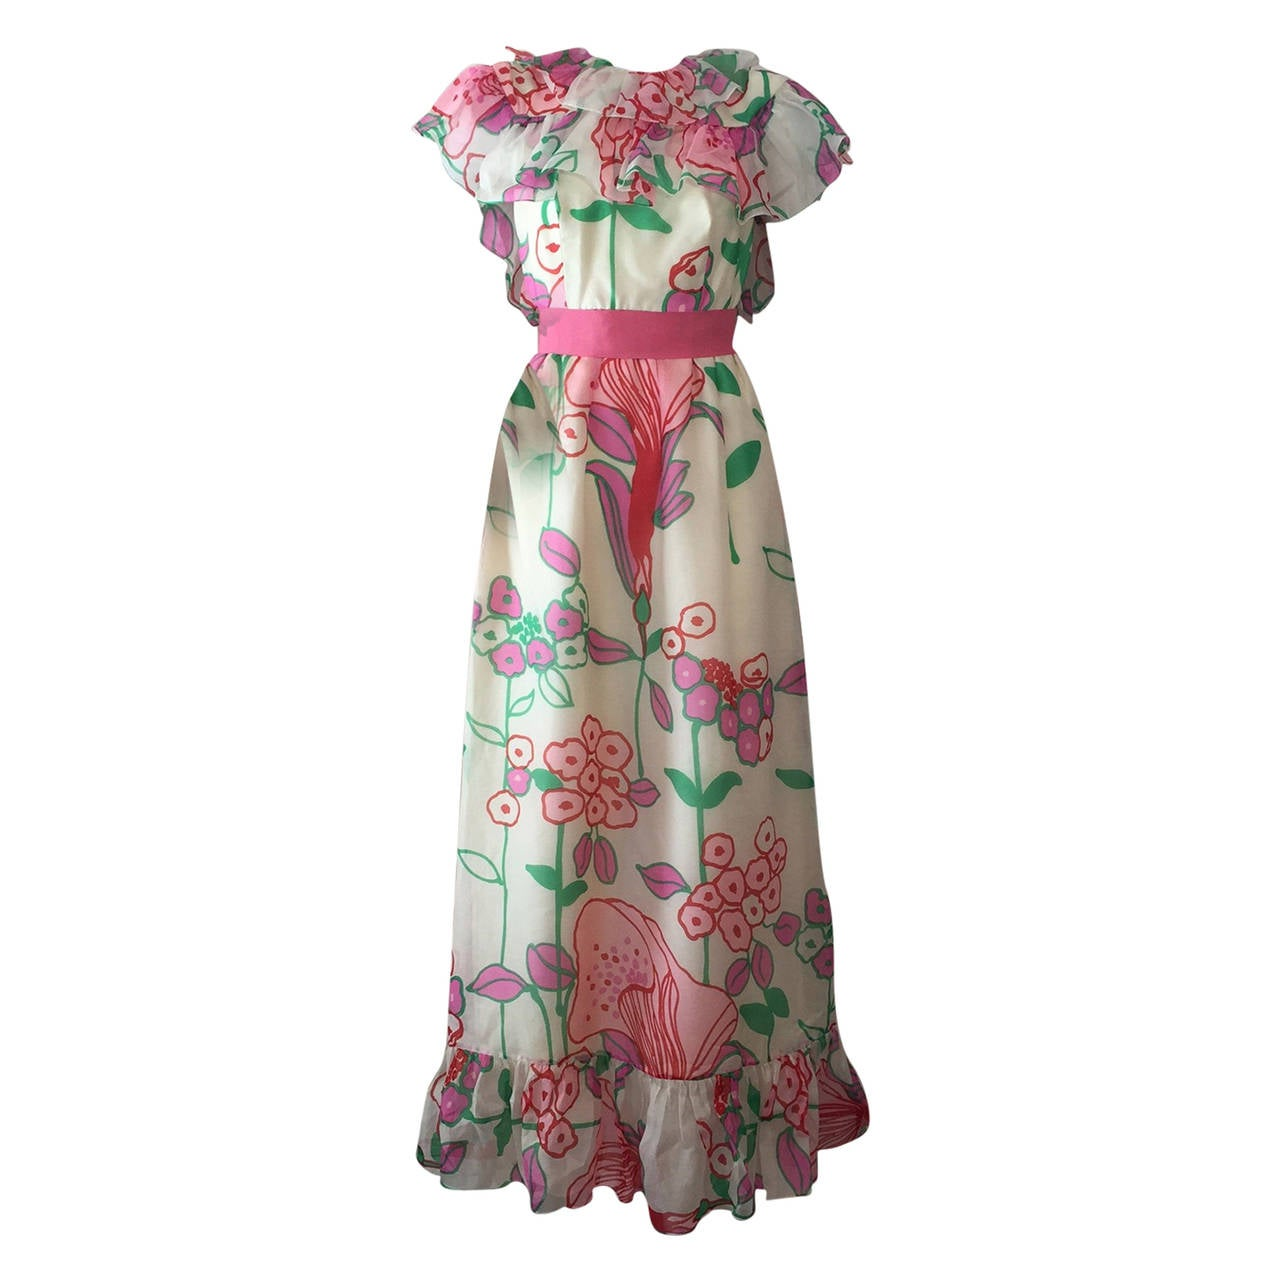 1960s Kiki Hart Floral Print Organza Maxi Dress with Ruffled Collar